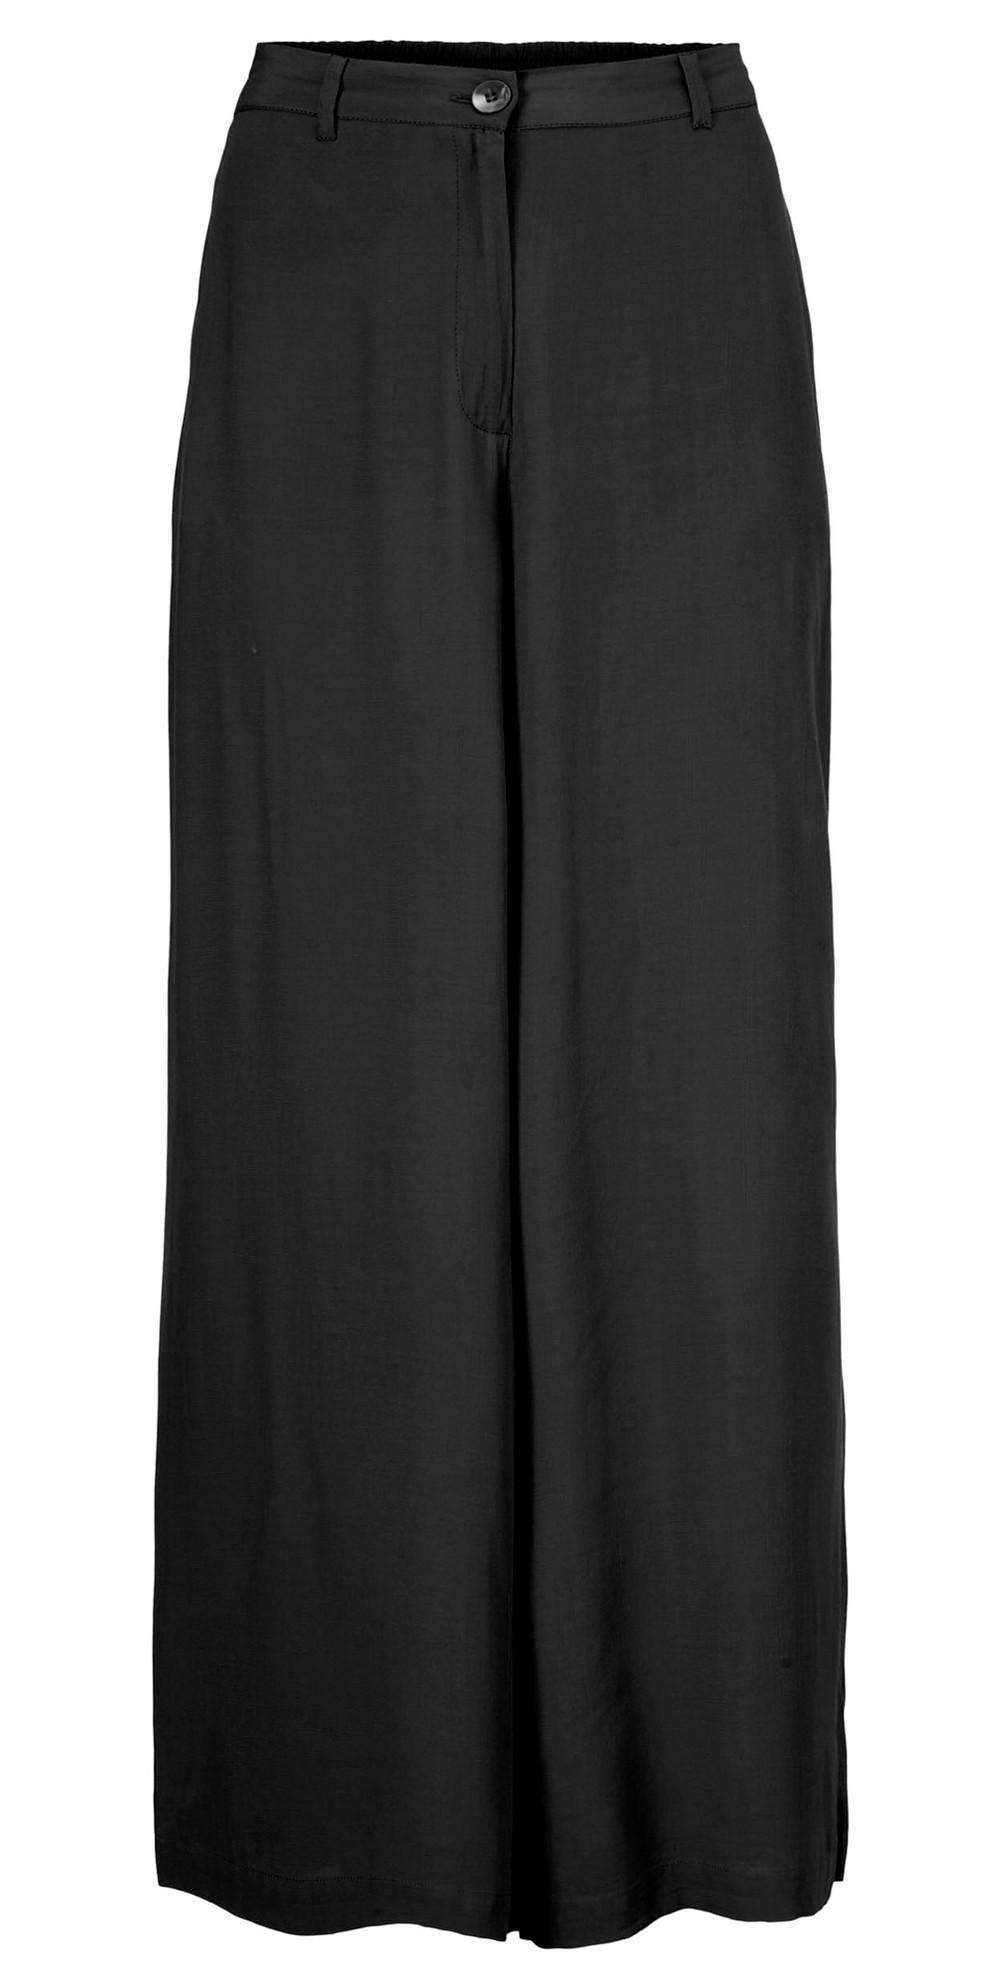 Perinus Trousers main image